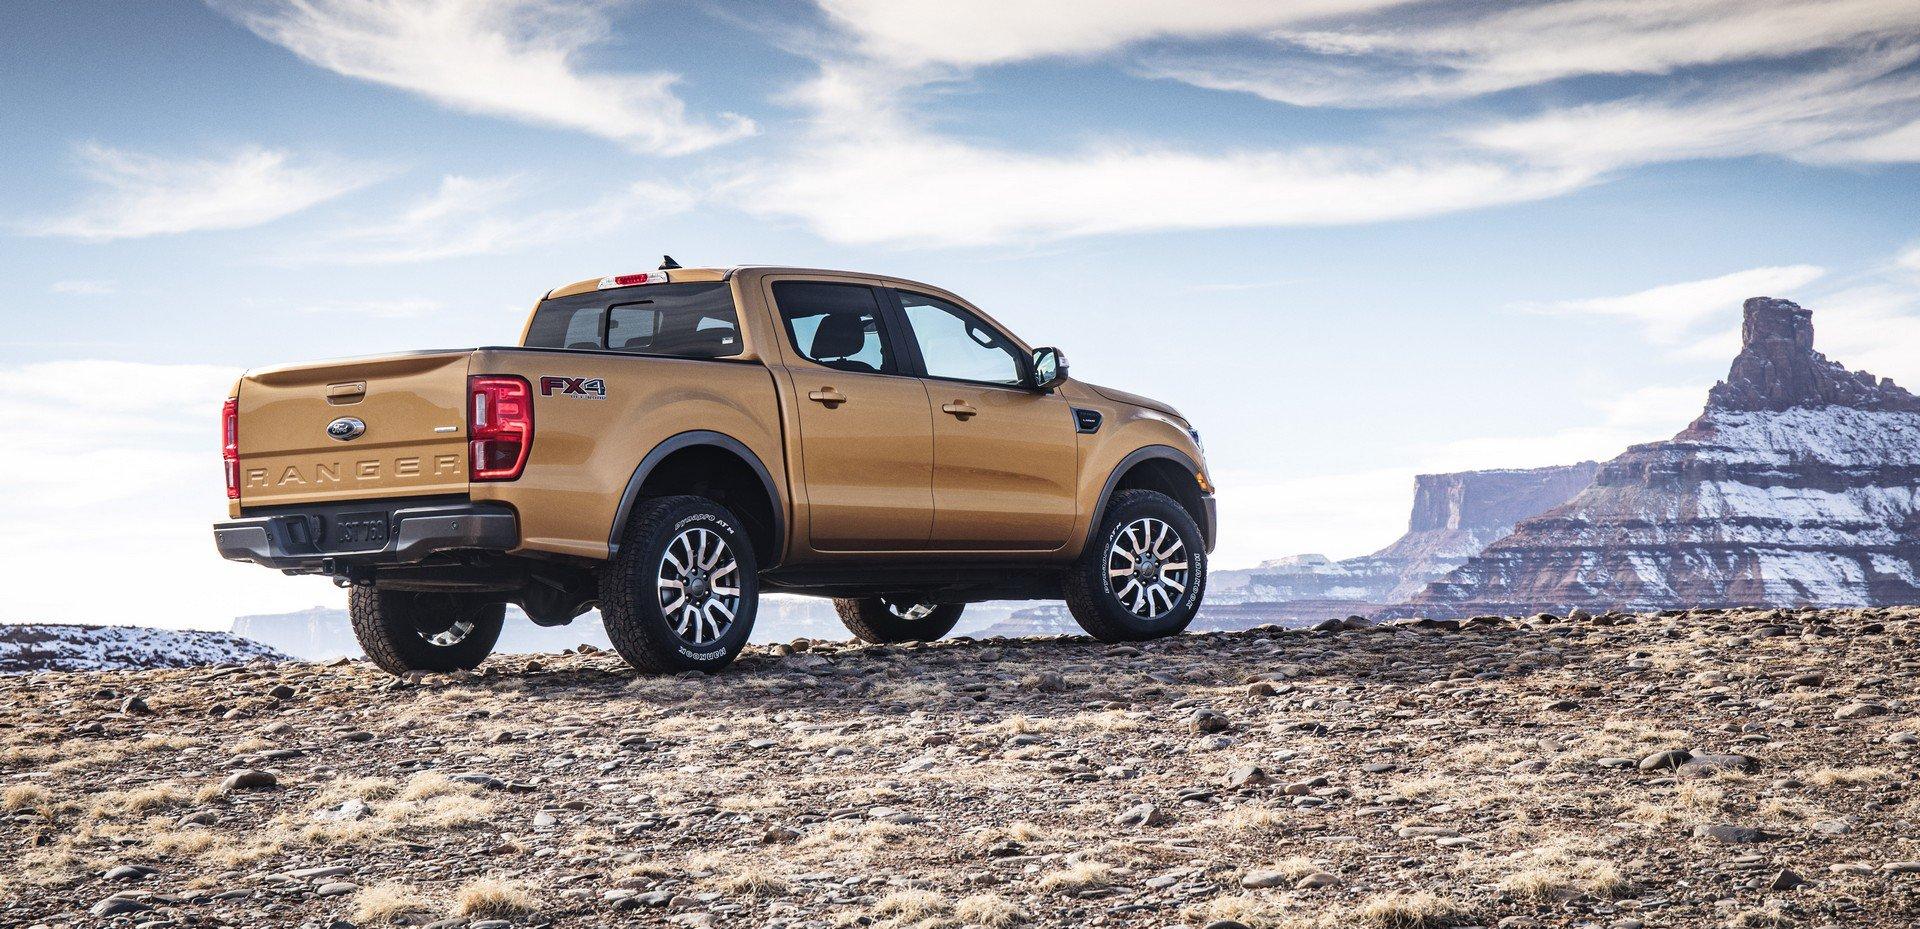 Ford-Ranger-2019-co-gia-tu-567-trieu-dong-anh-3